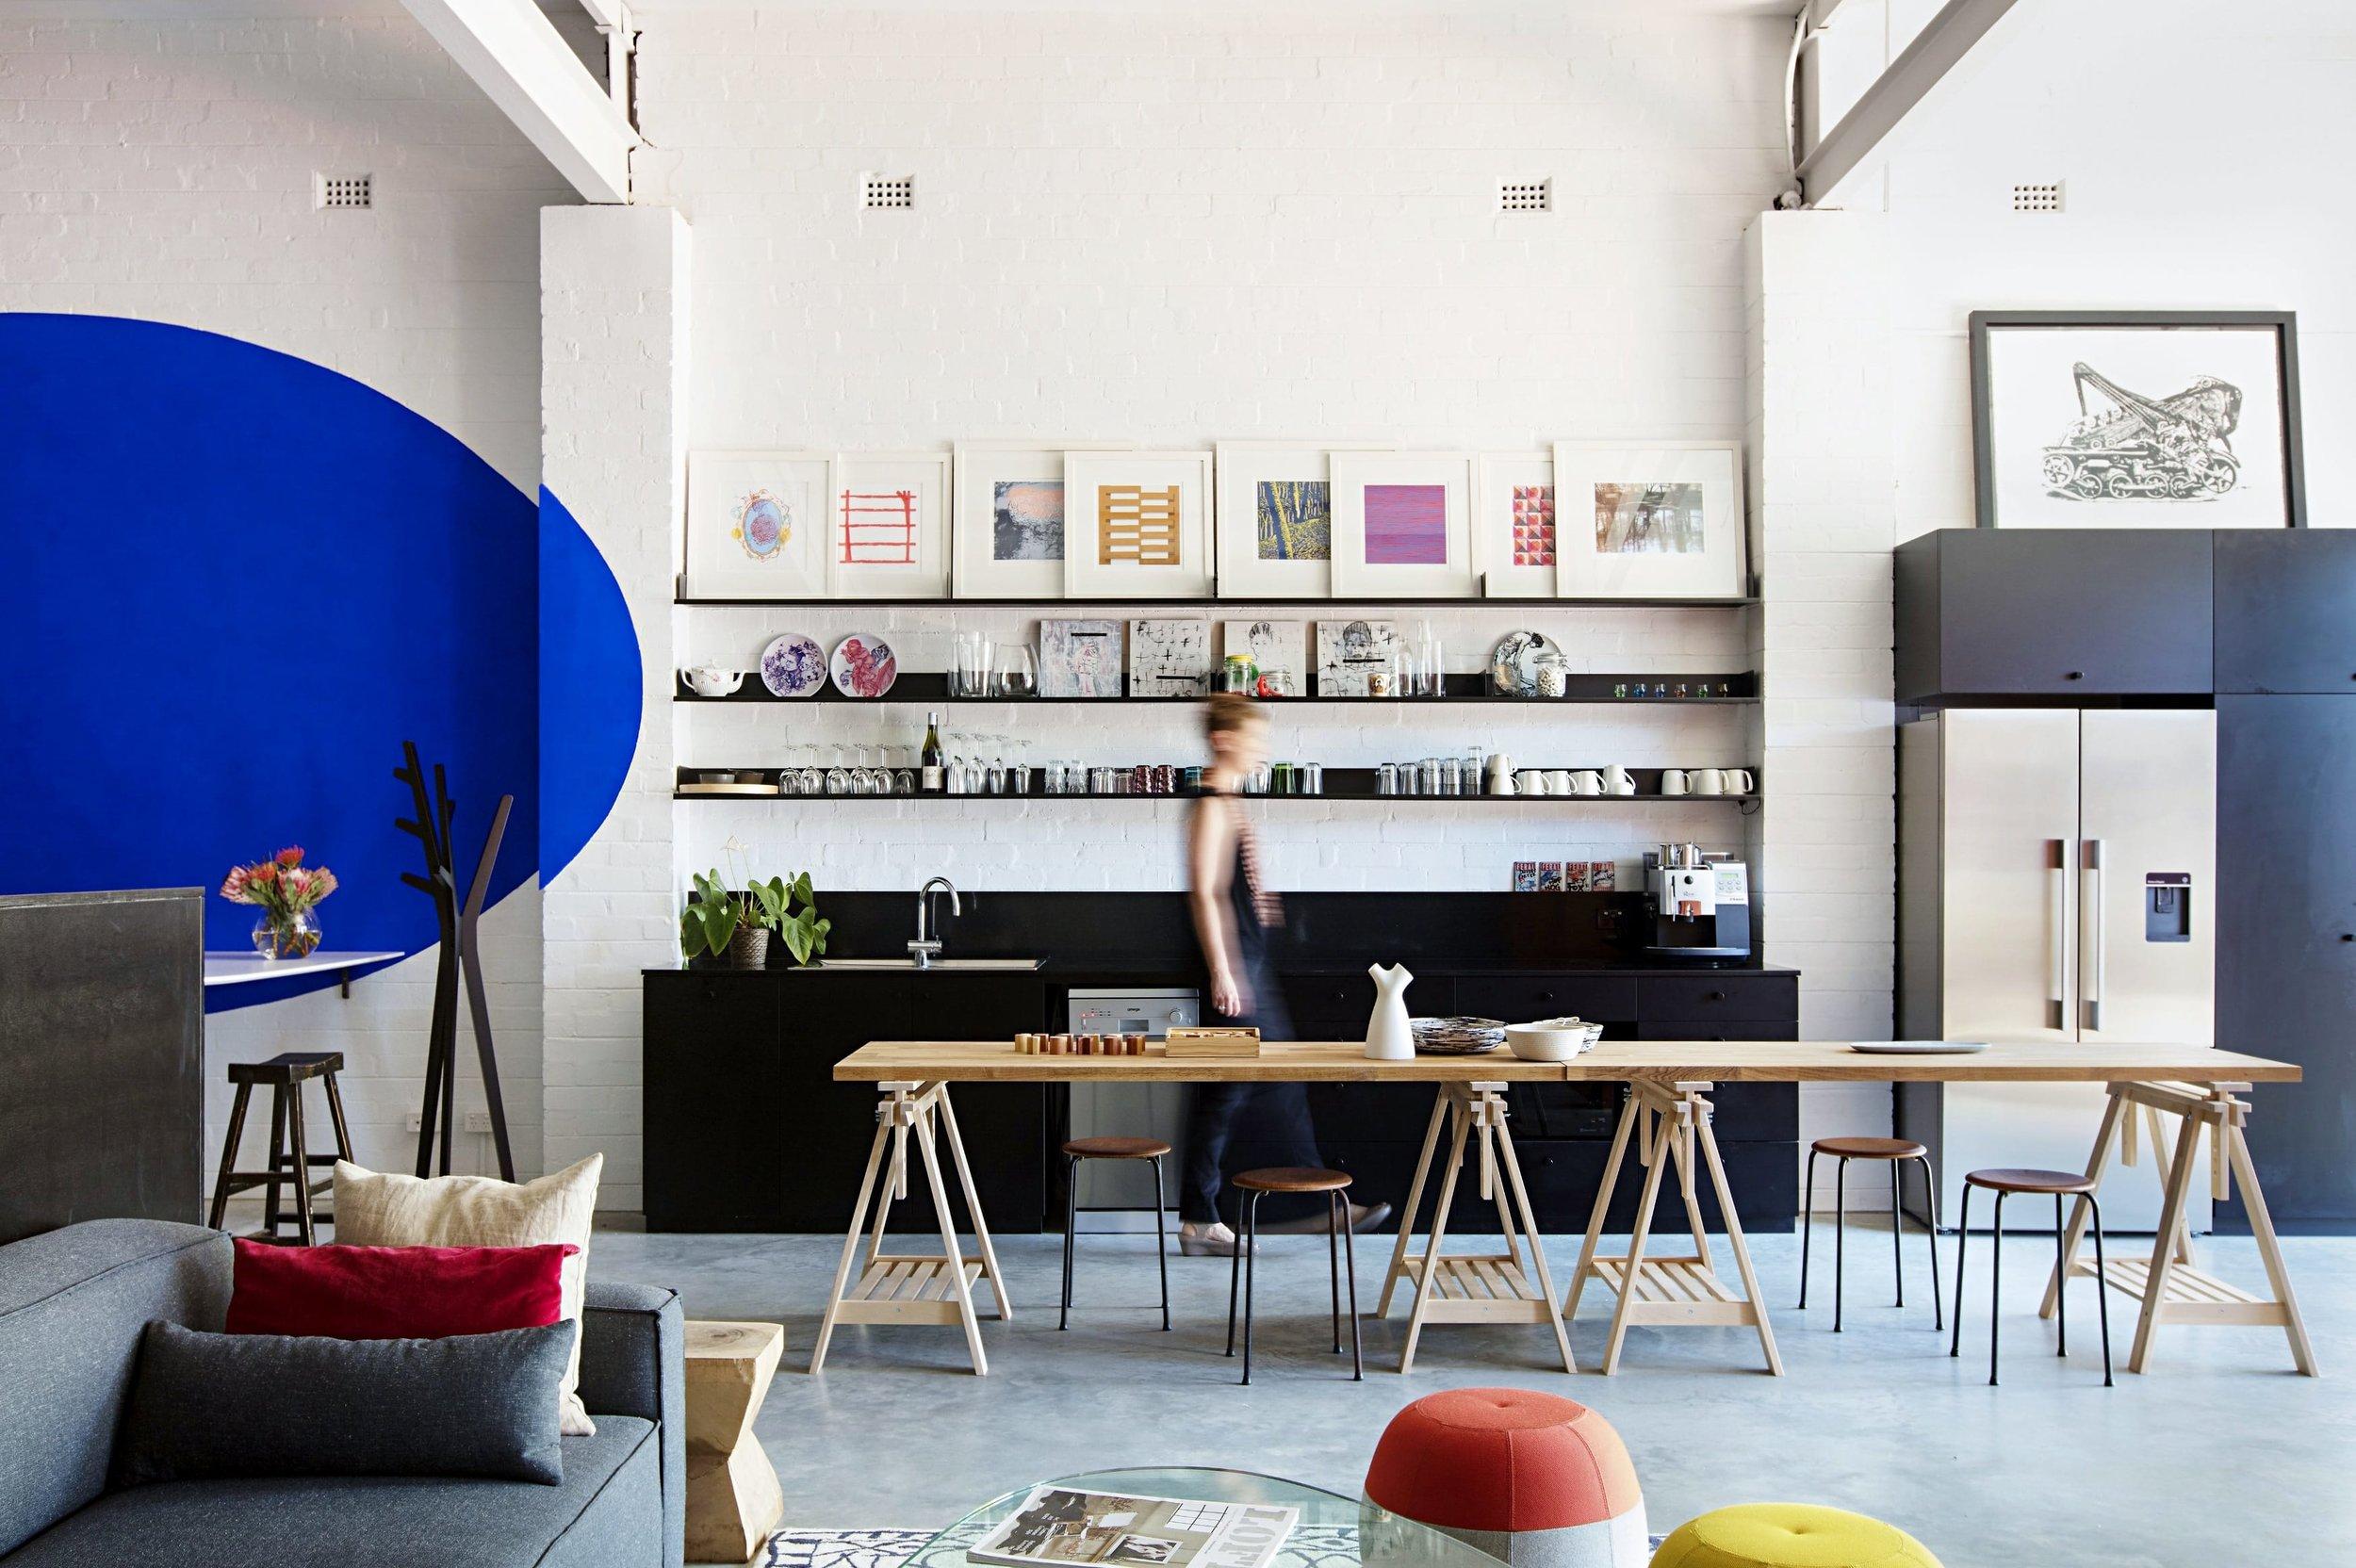 Bosske_Block_Branding_HQ_Tearoom.jpg